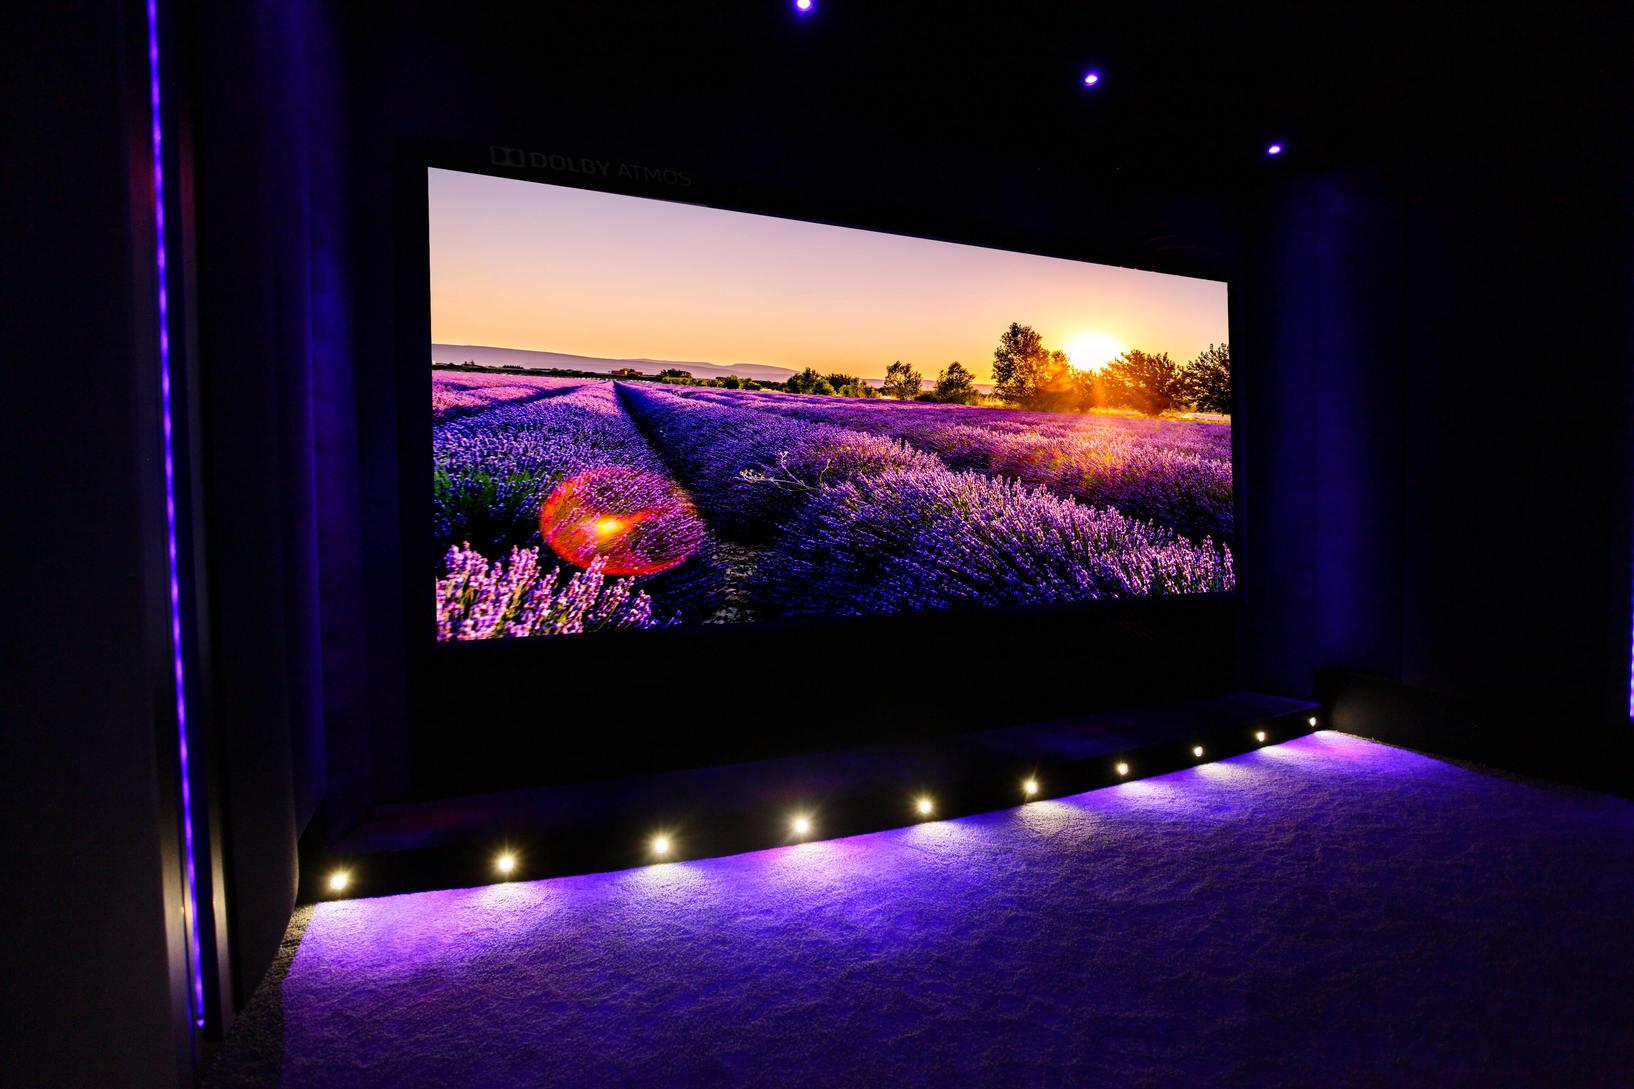 Cinema Prive Salle Dediee Ou Piece De Vie Home Cinema